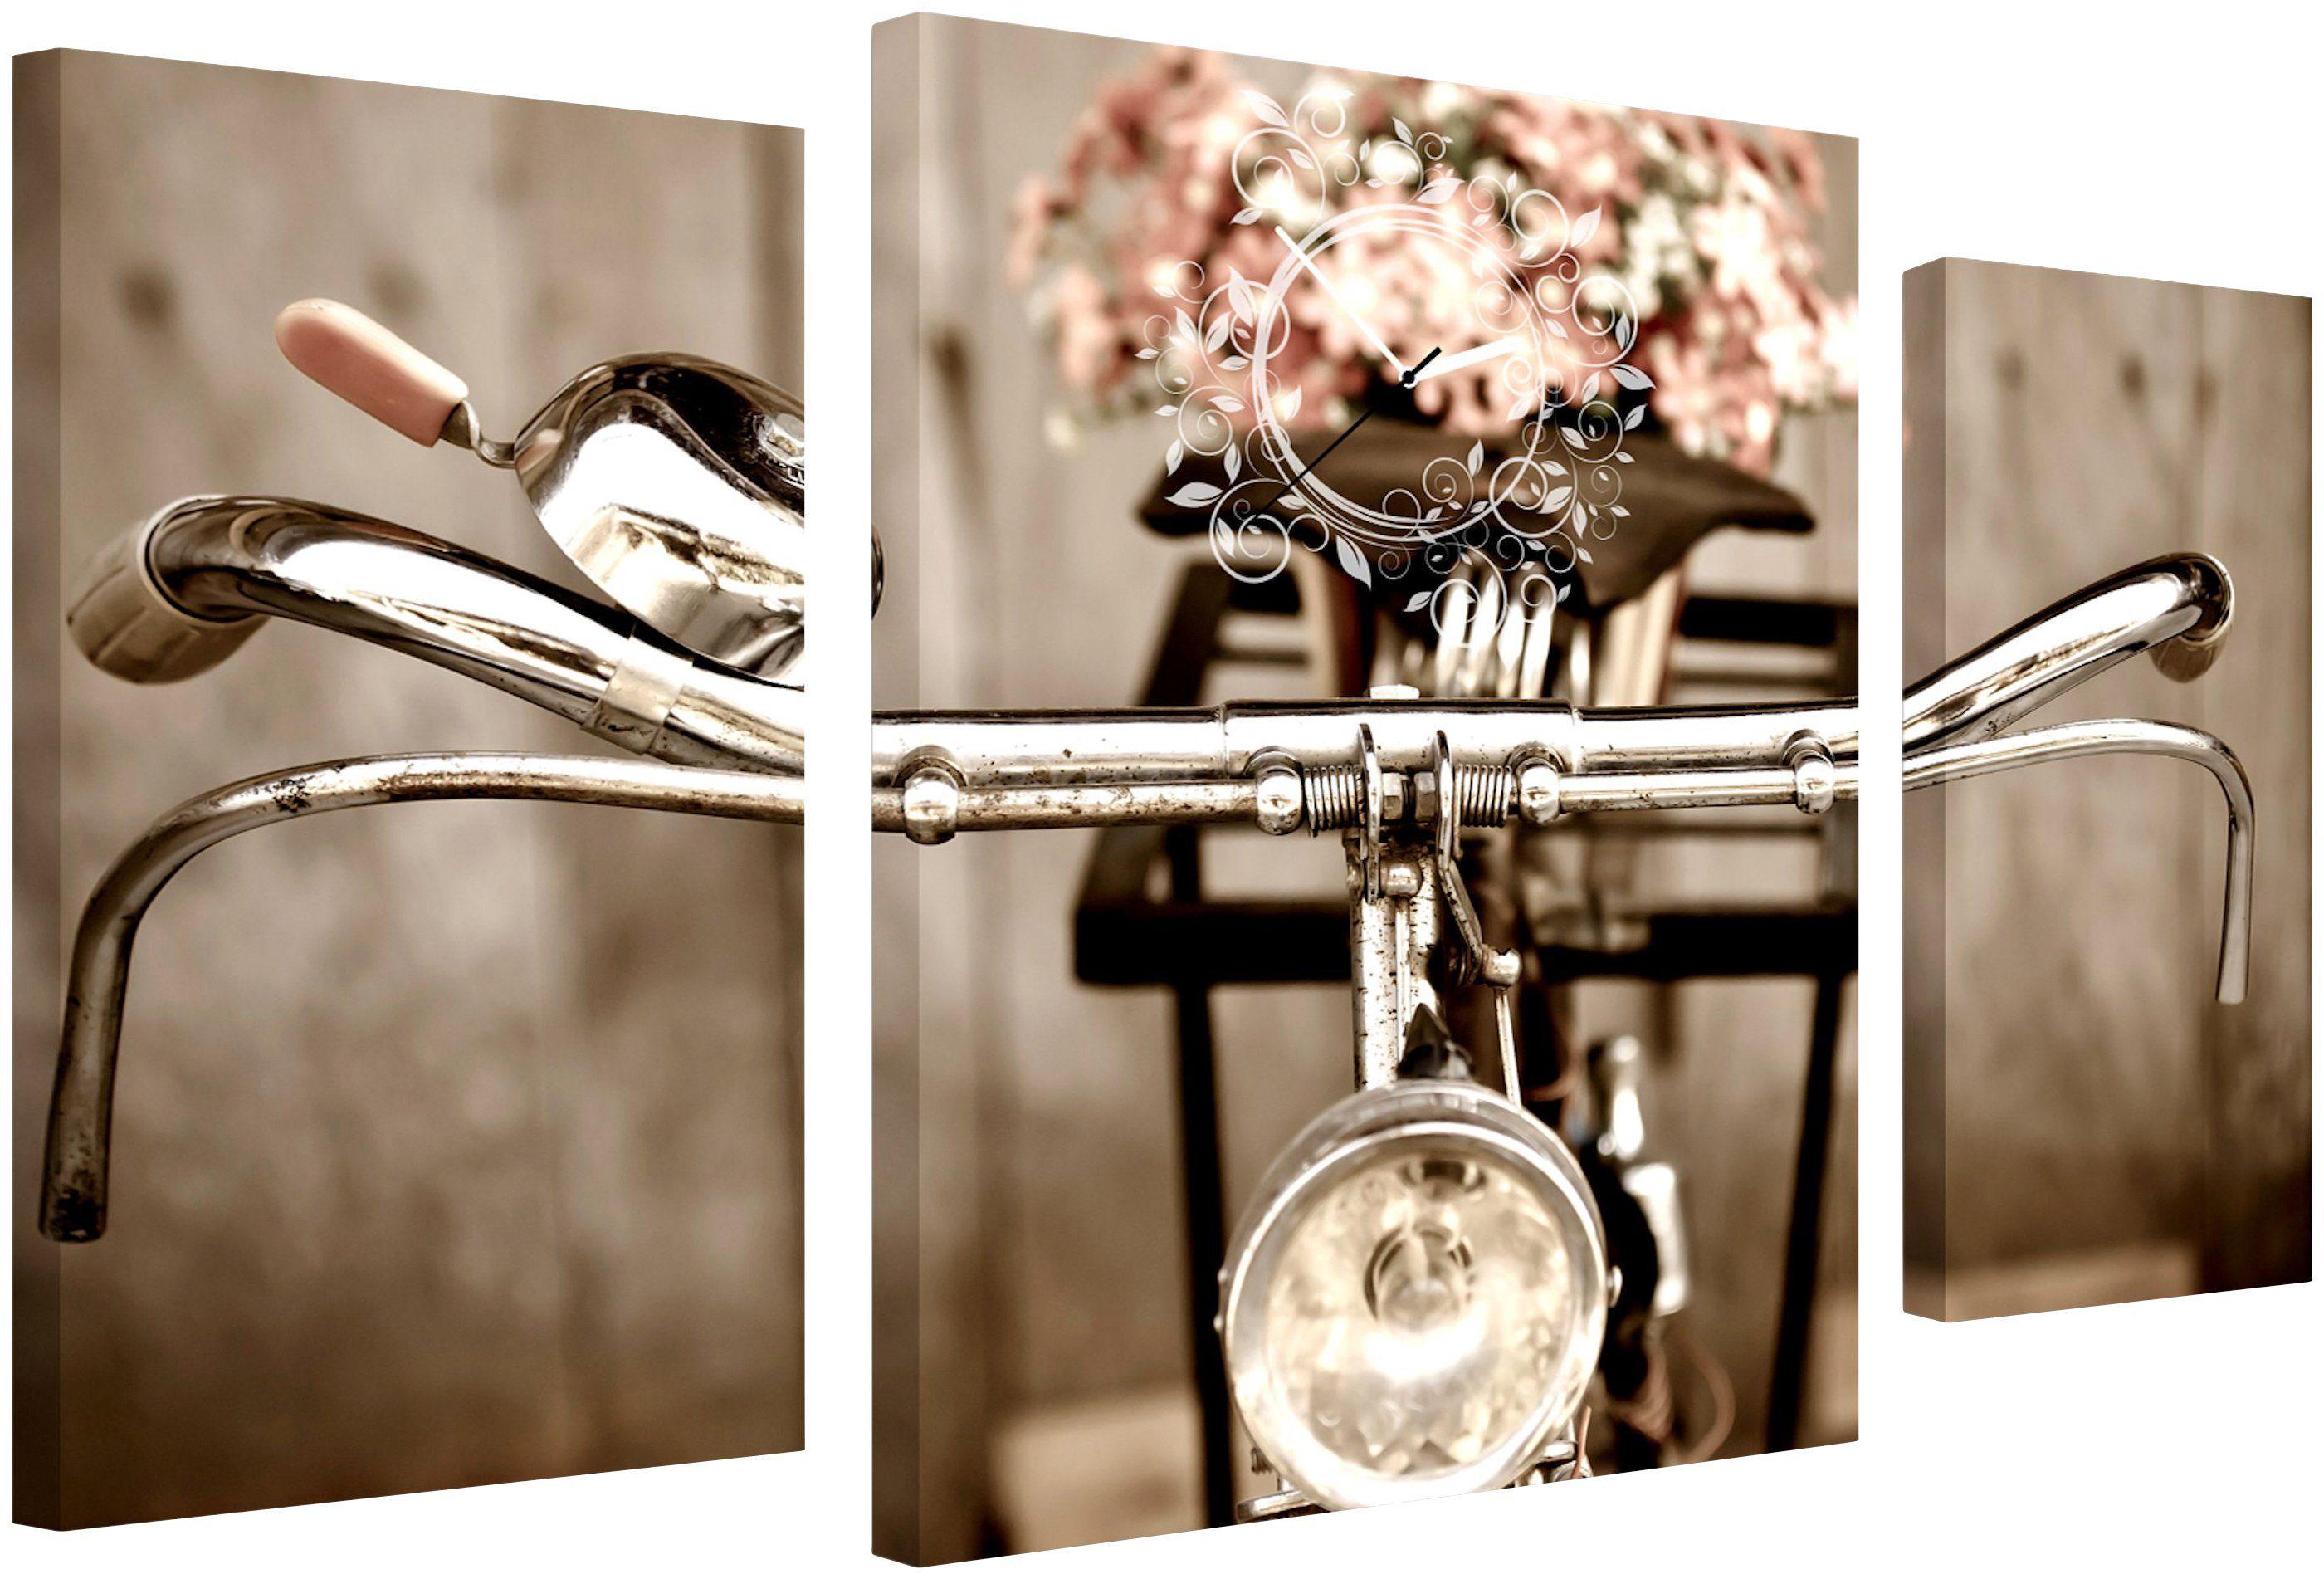 Komplett-Set: Leinwand »Old City Bike«, mit dekorativer Uhr